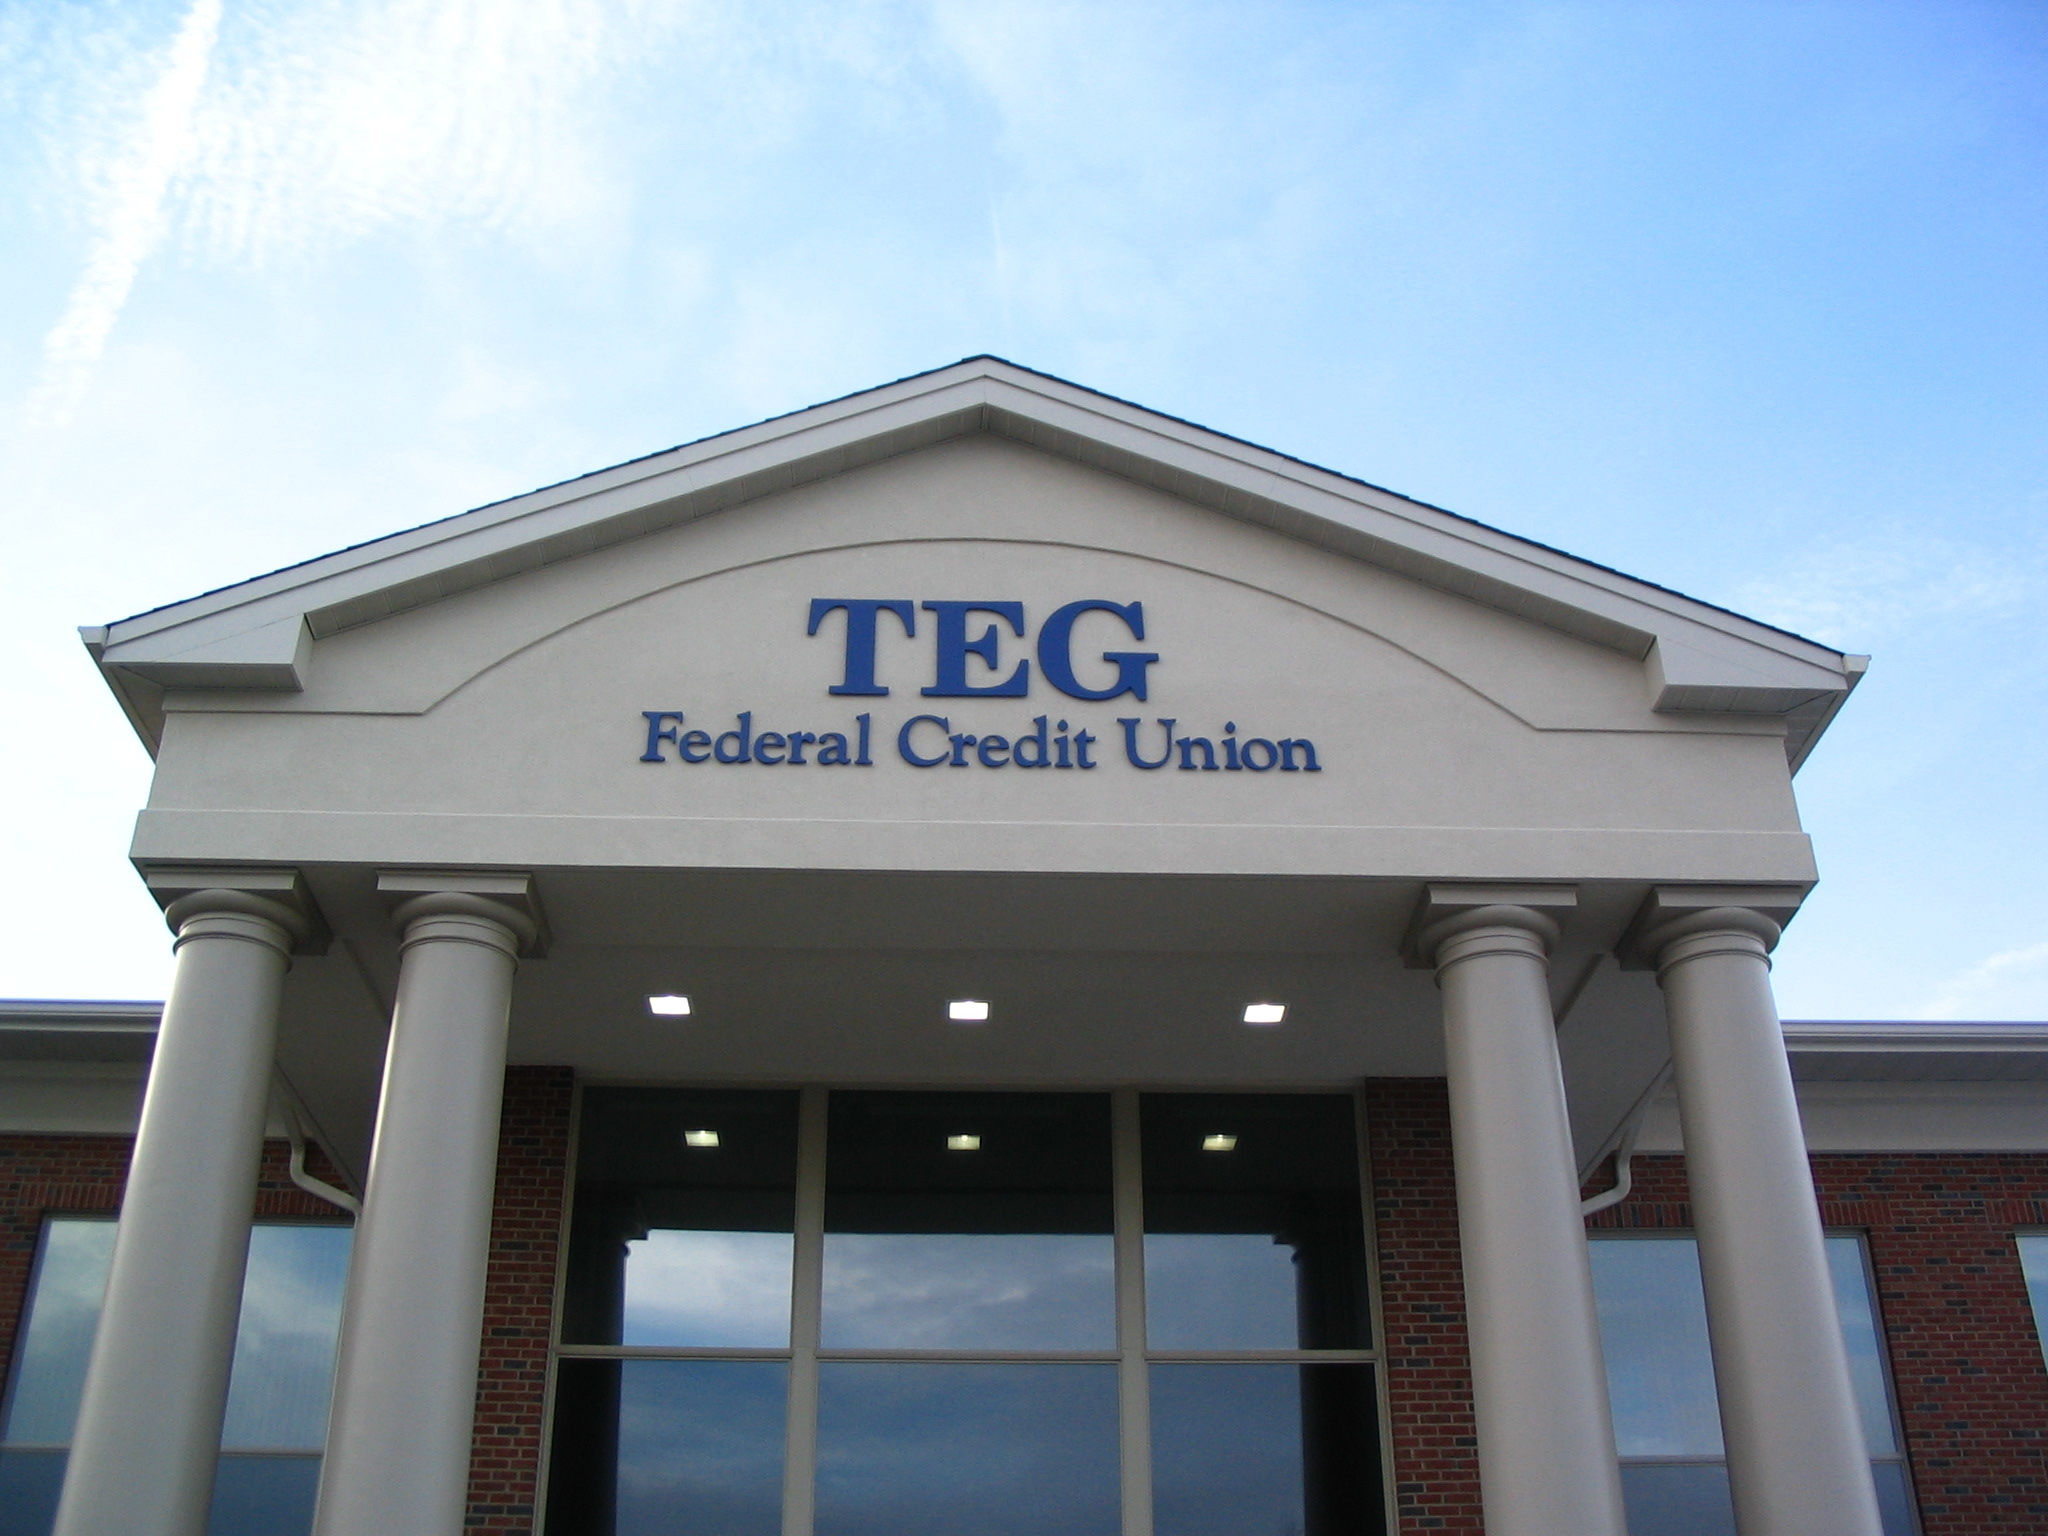 TEG Federal Credit Union image 1